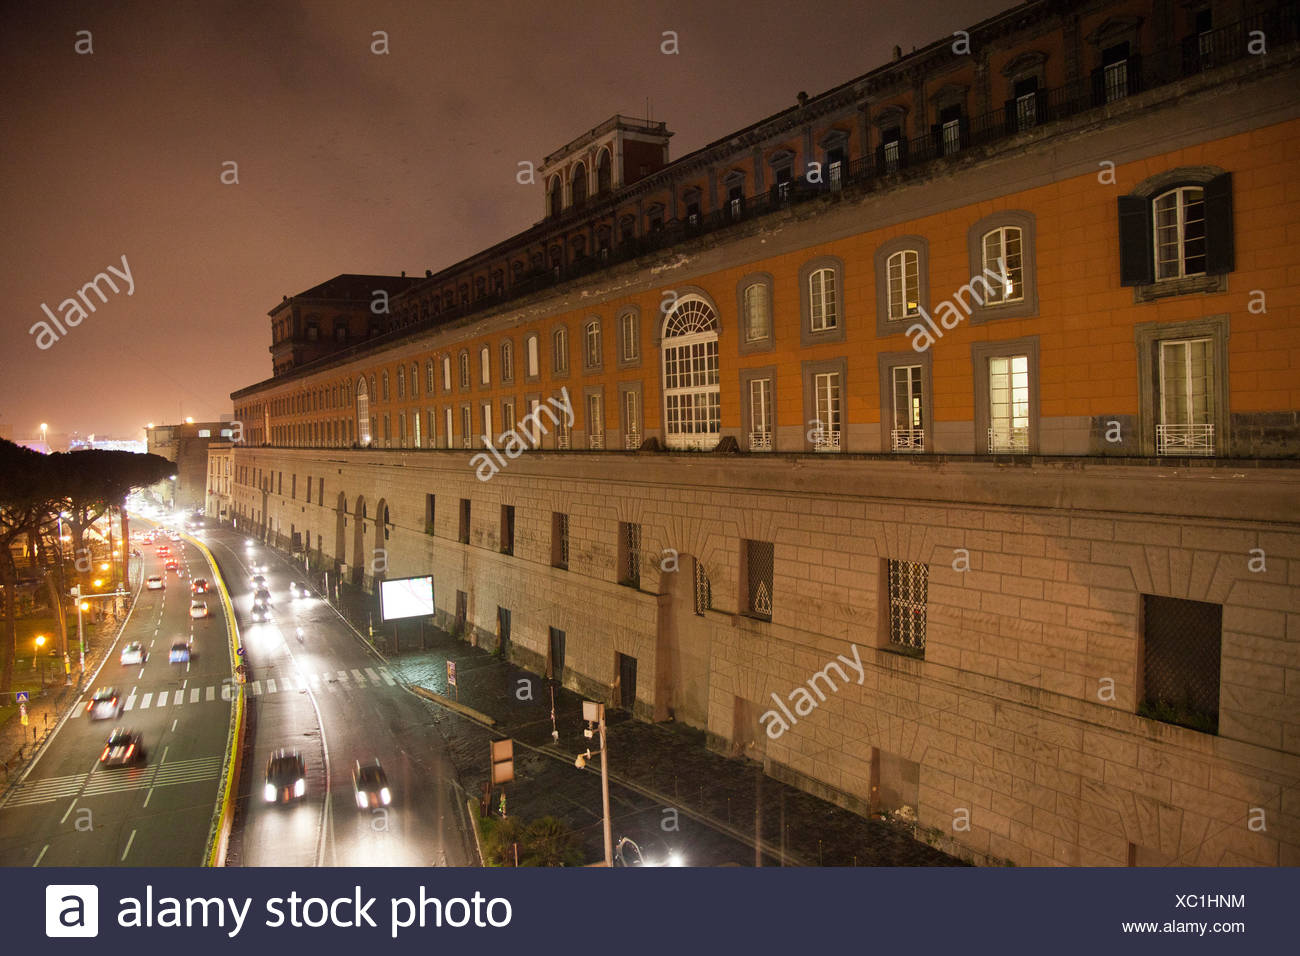 Campania, Golf von Neapel, Italien, Kampanien, Meer, Mittelmeer, Neapel, Palazzo Reale - Stock Image